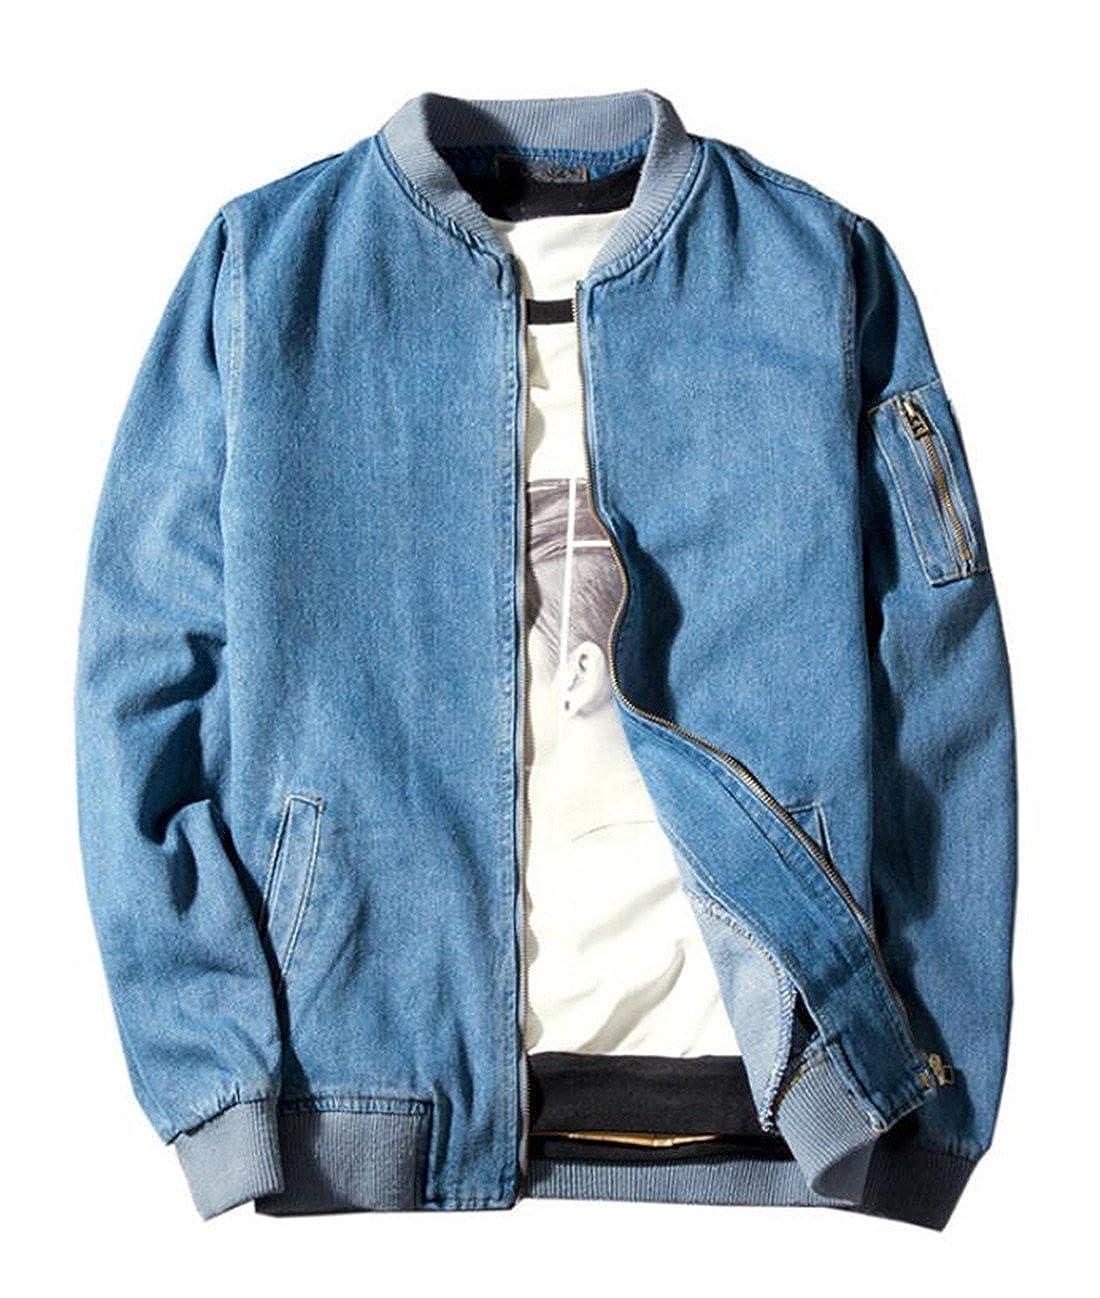 BYWX Men Casual Cotton Long Sleeve Denim Baseball Bomber Jacket